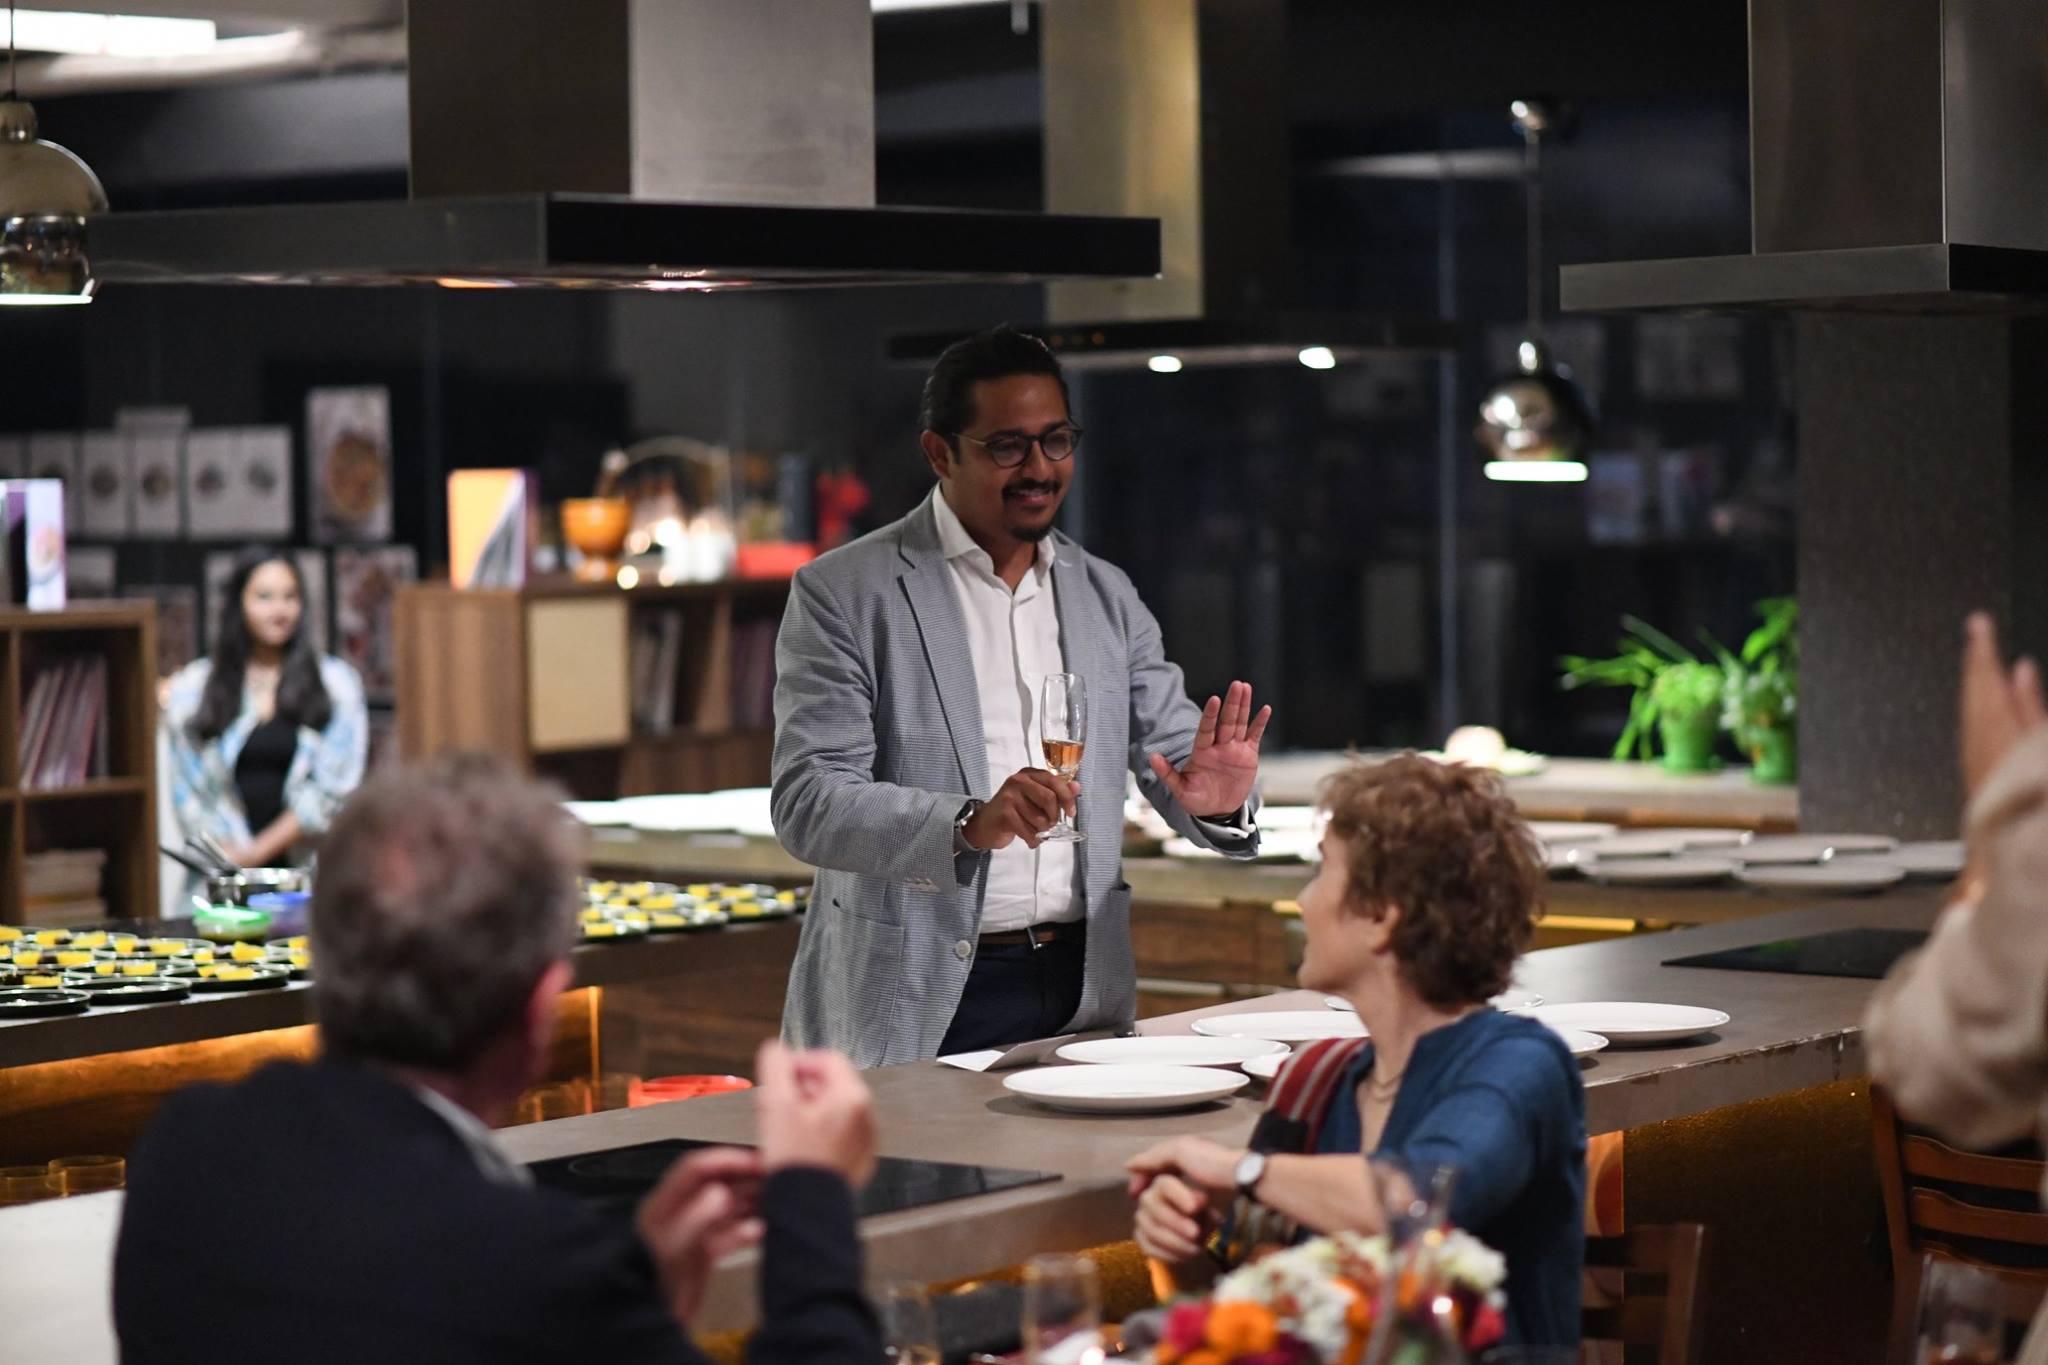 Cuisine, Featured, Food, Kanu Gupta, Lunch, Online Exclusive, Savor Experiences, Secret Supper Project, Wine & Dine